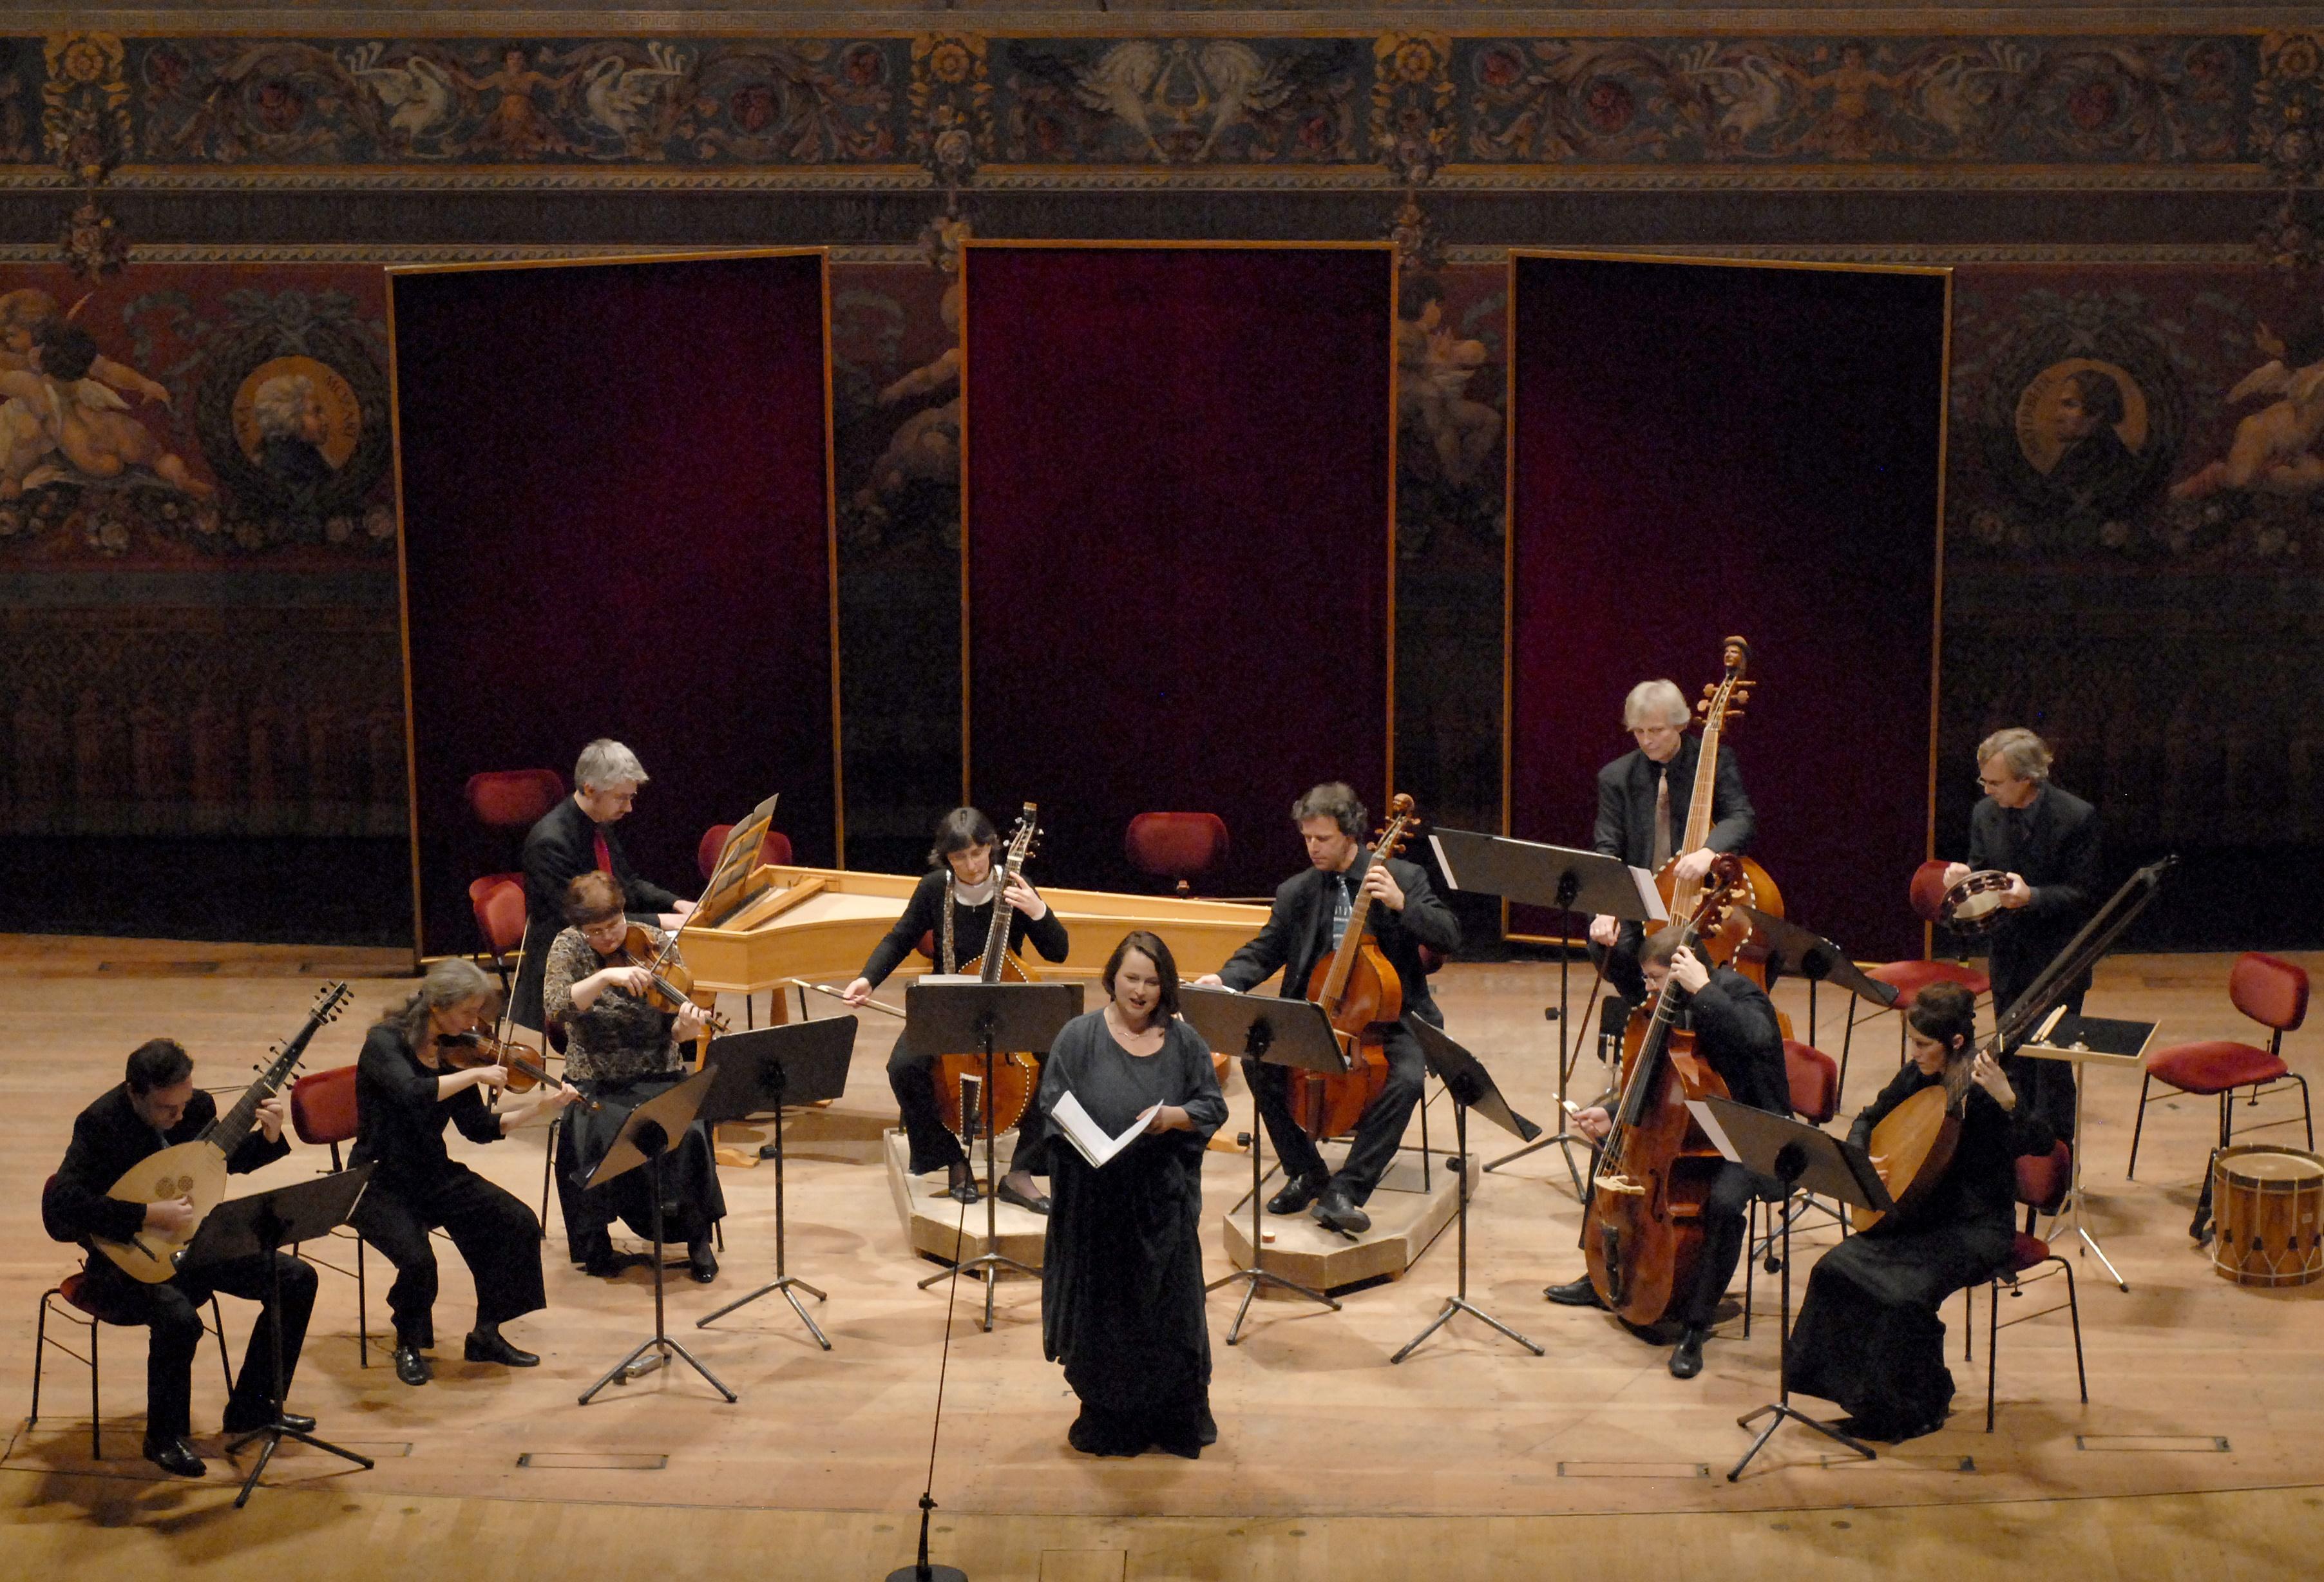 Cappella Sagittariana Dresden in der Semperoper Dresden | Foto: Matthias Creutziger